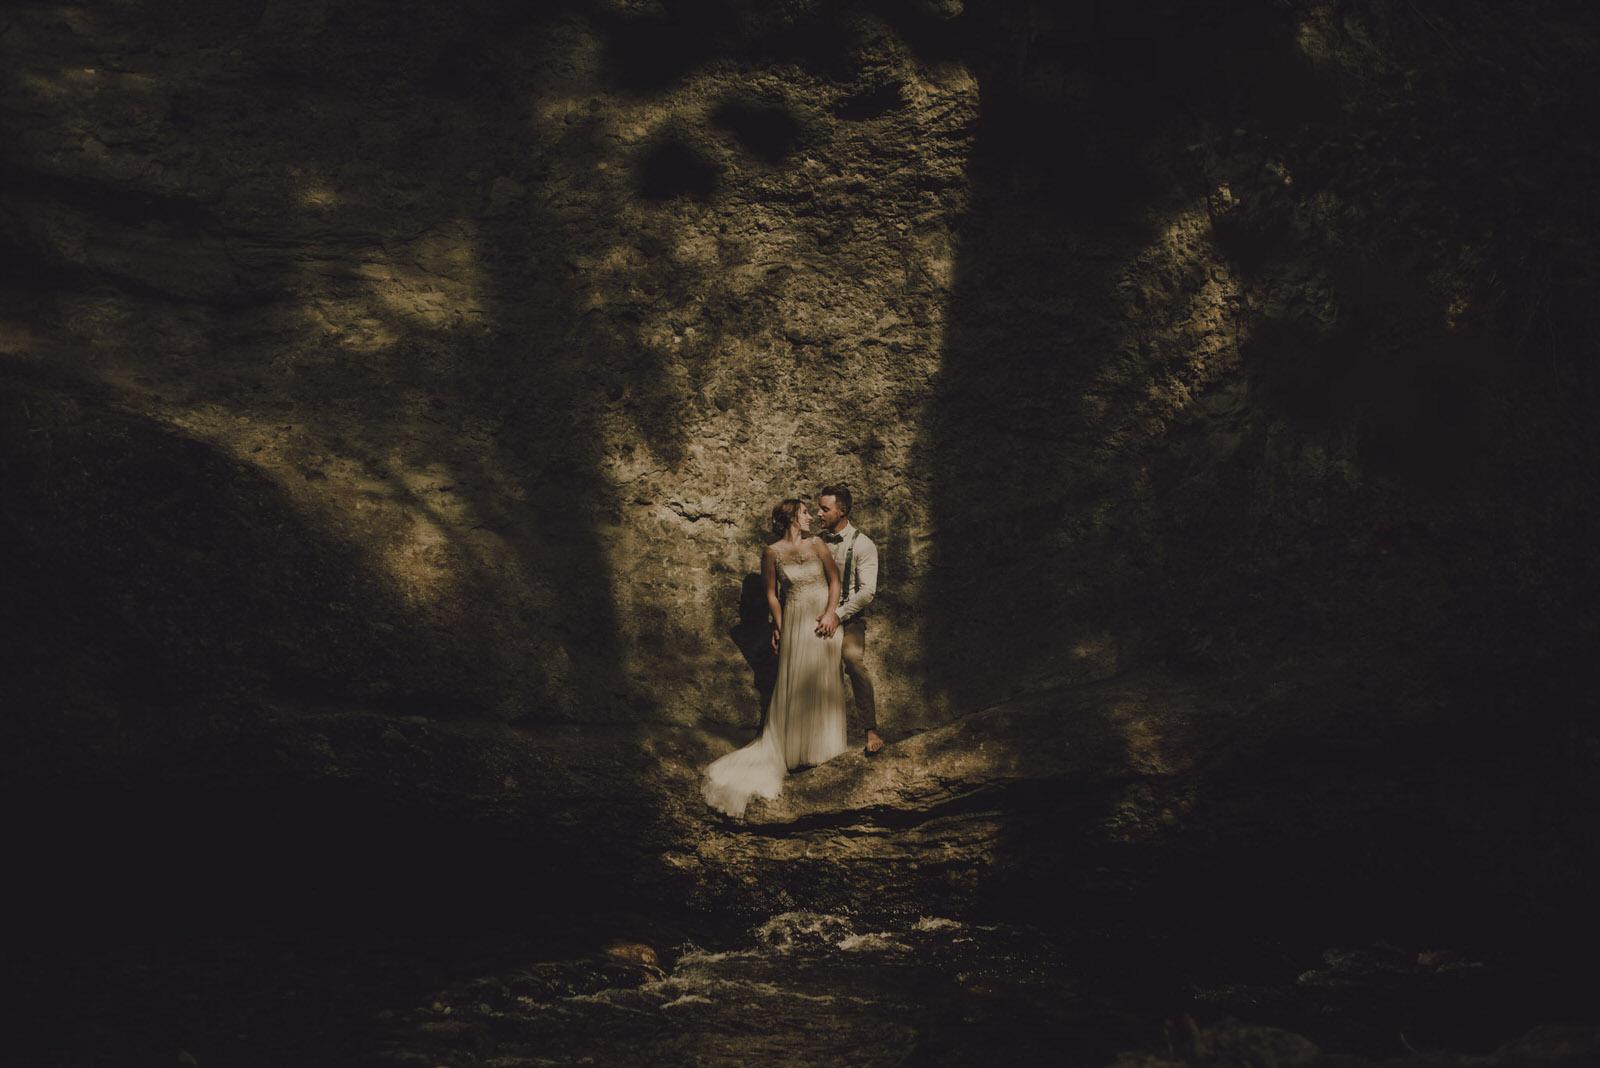 Kelowna Wedding Photographer - Kayla Bowie Creative